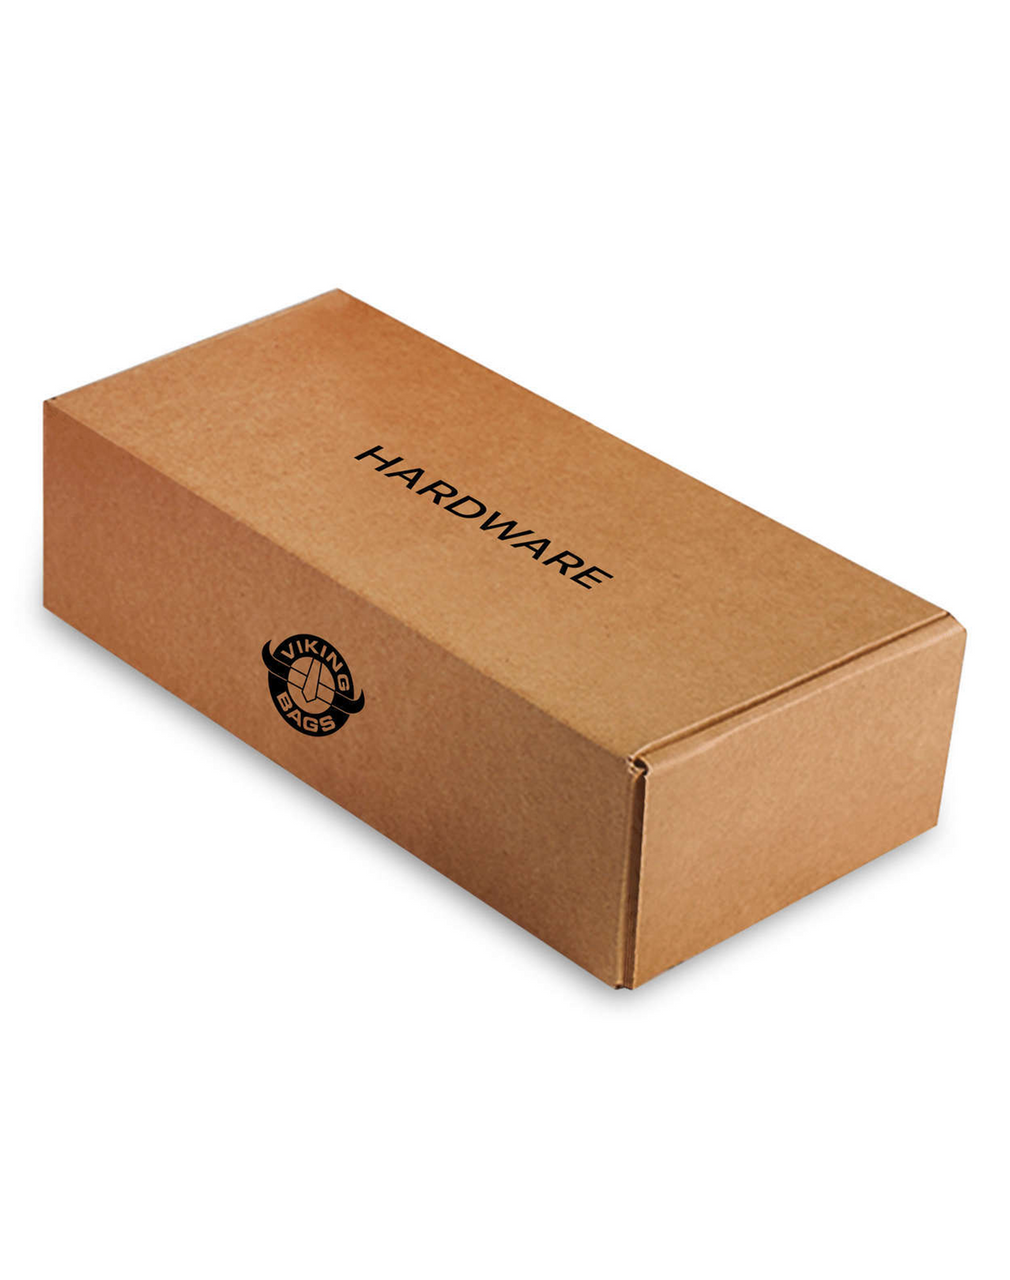 Triumph Rocket III Roadster Side Pocket Studded Motorcycle Saddlebags Box